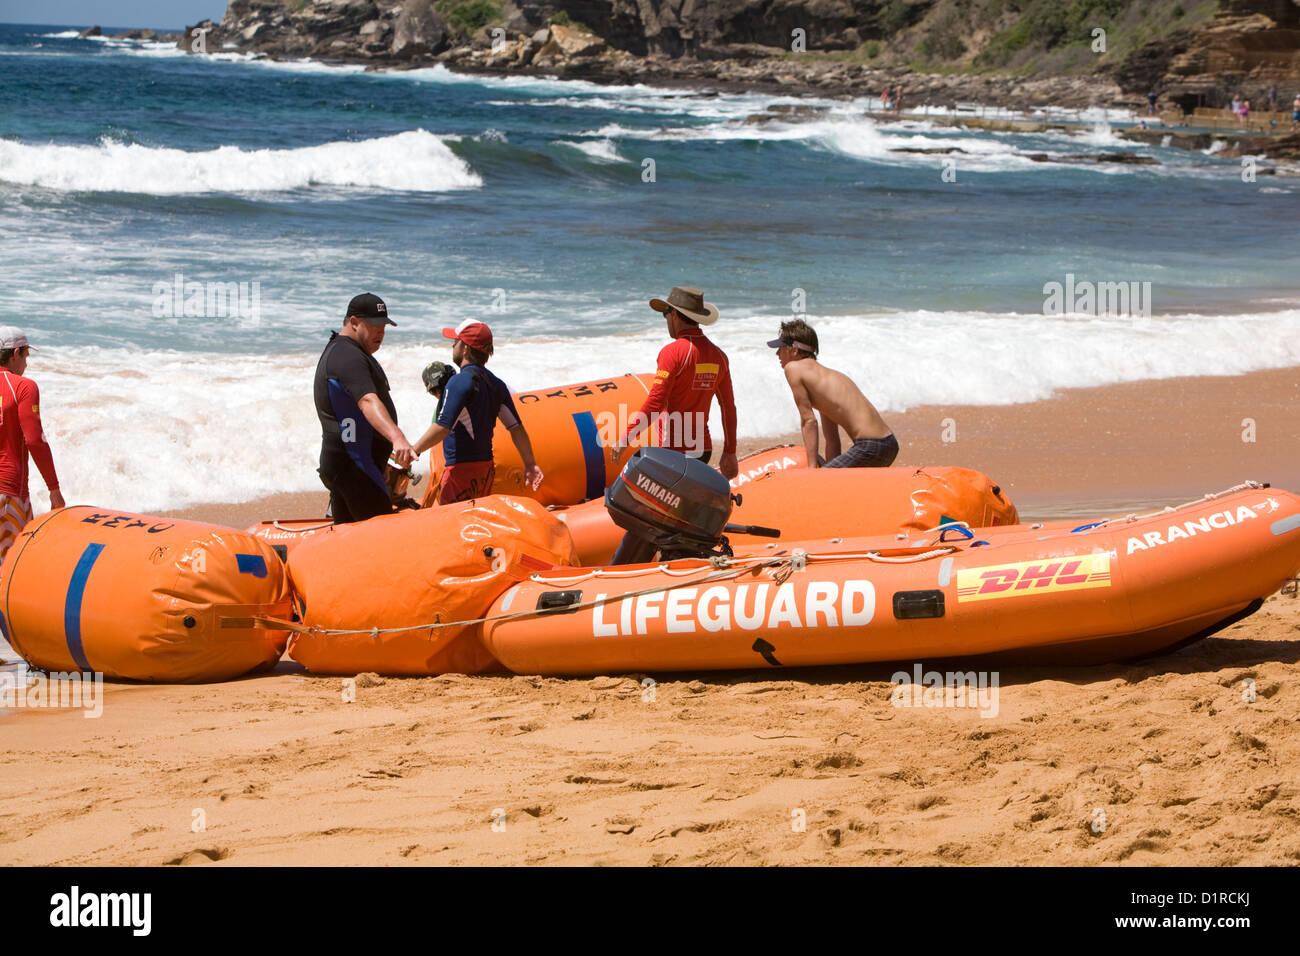 a409885d016 lifeguard and surf rescue team on avalon beach